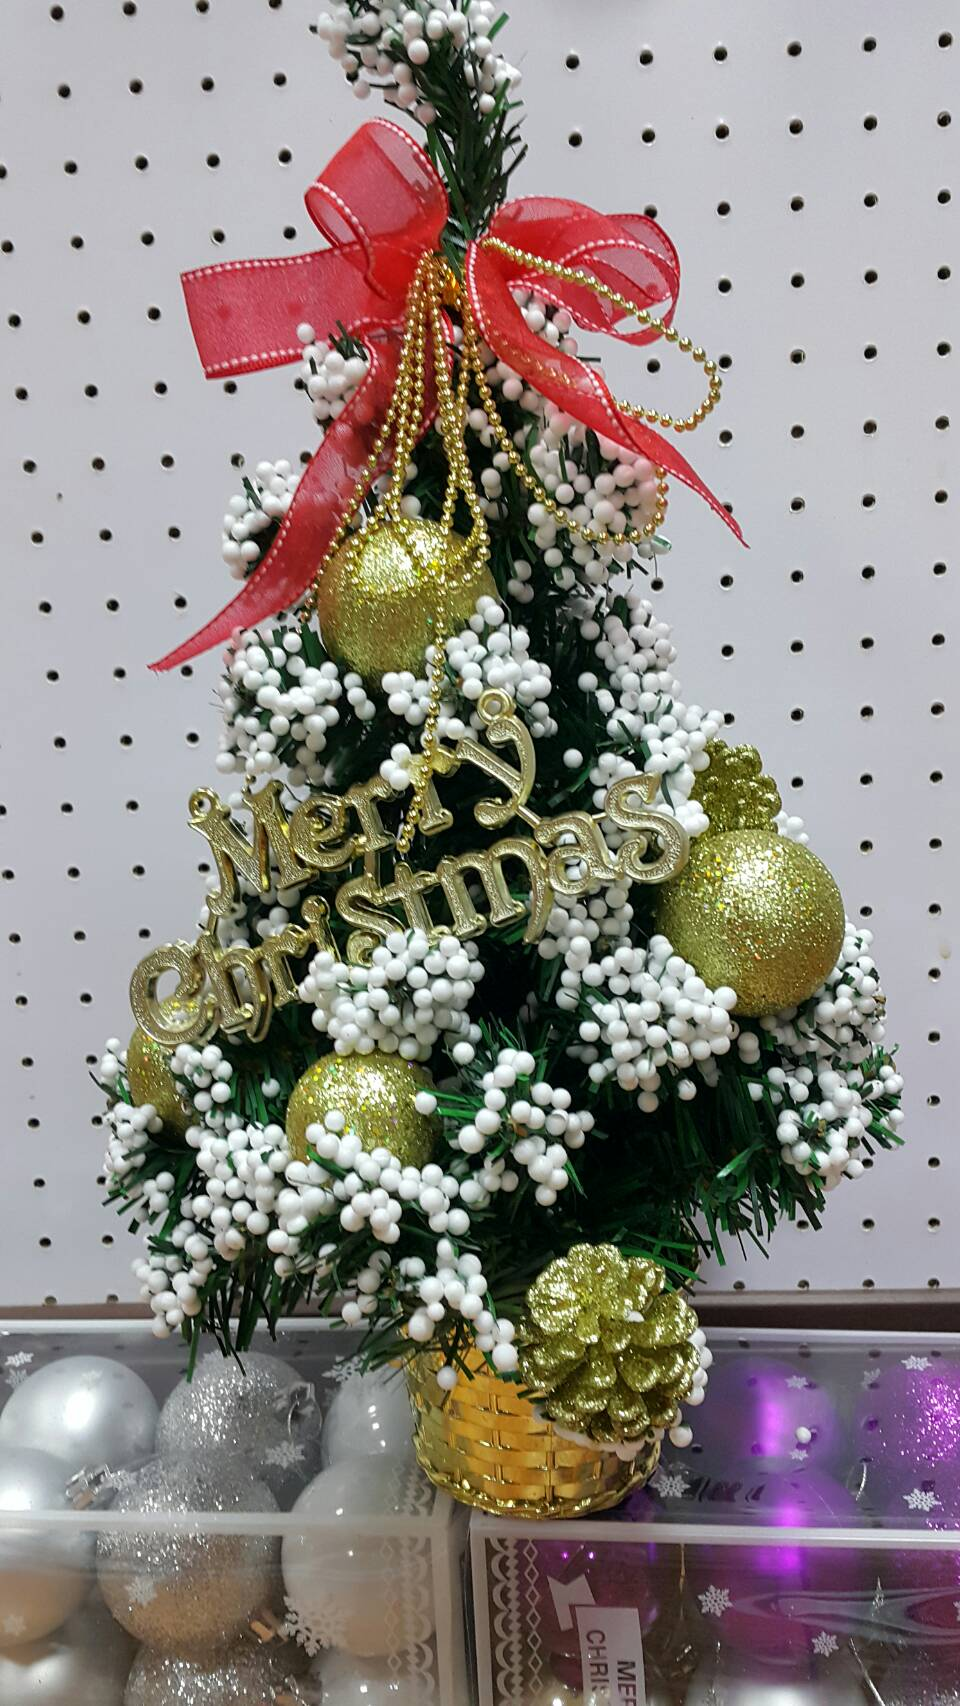 X射線【X392405】35cm雪花裝飾樹(金),聖誕樹/聖誕佈置/聖誕燈/會場佈置/材料包/成品樹/小樹